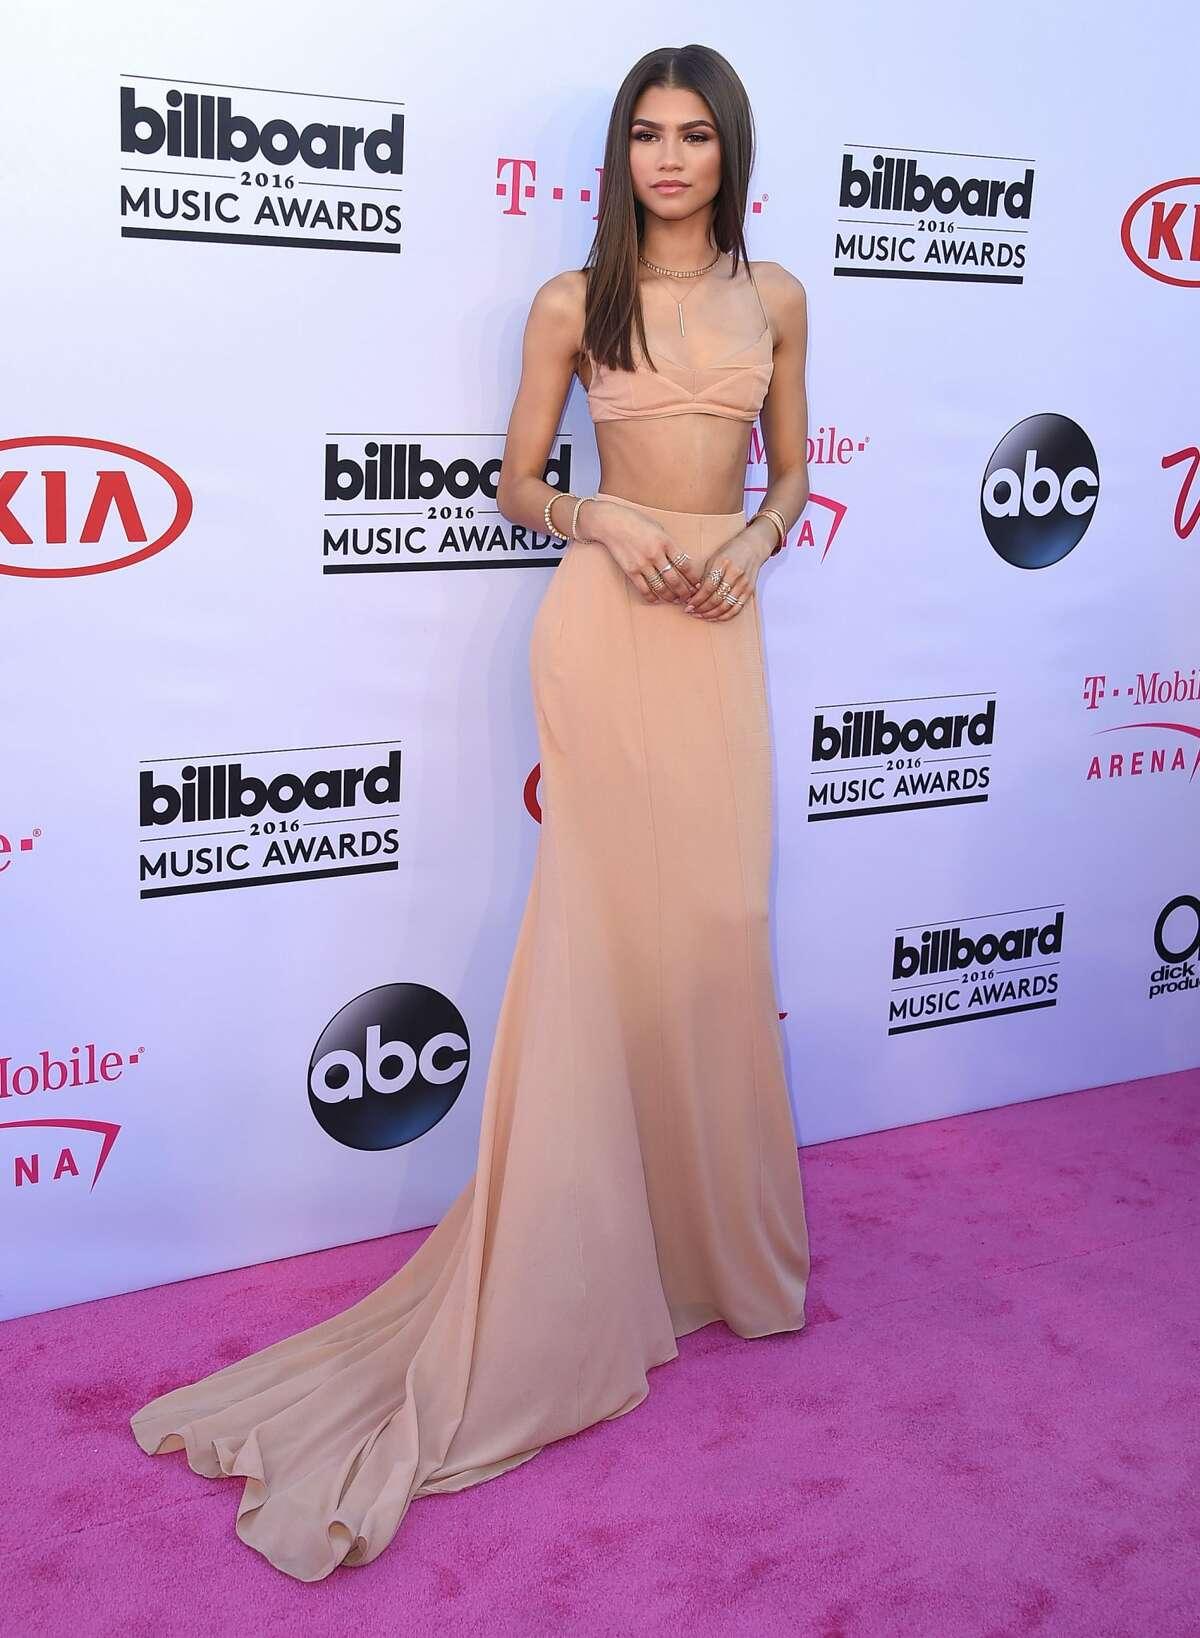 Zendaya arrives at the 2016 Billboard Music Awards at T-Mobile Arena in Las Vegas, Nevada.